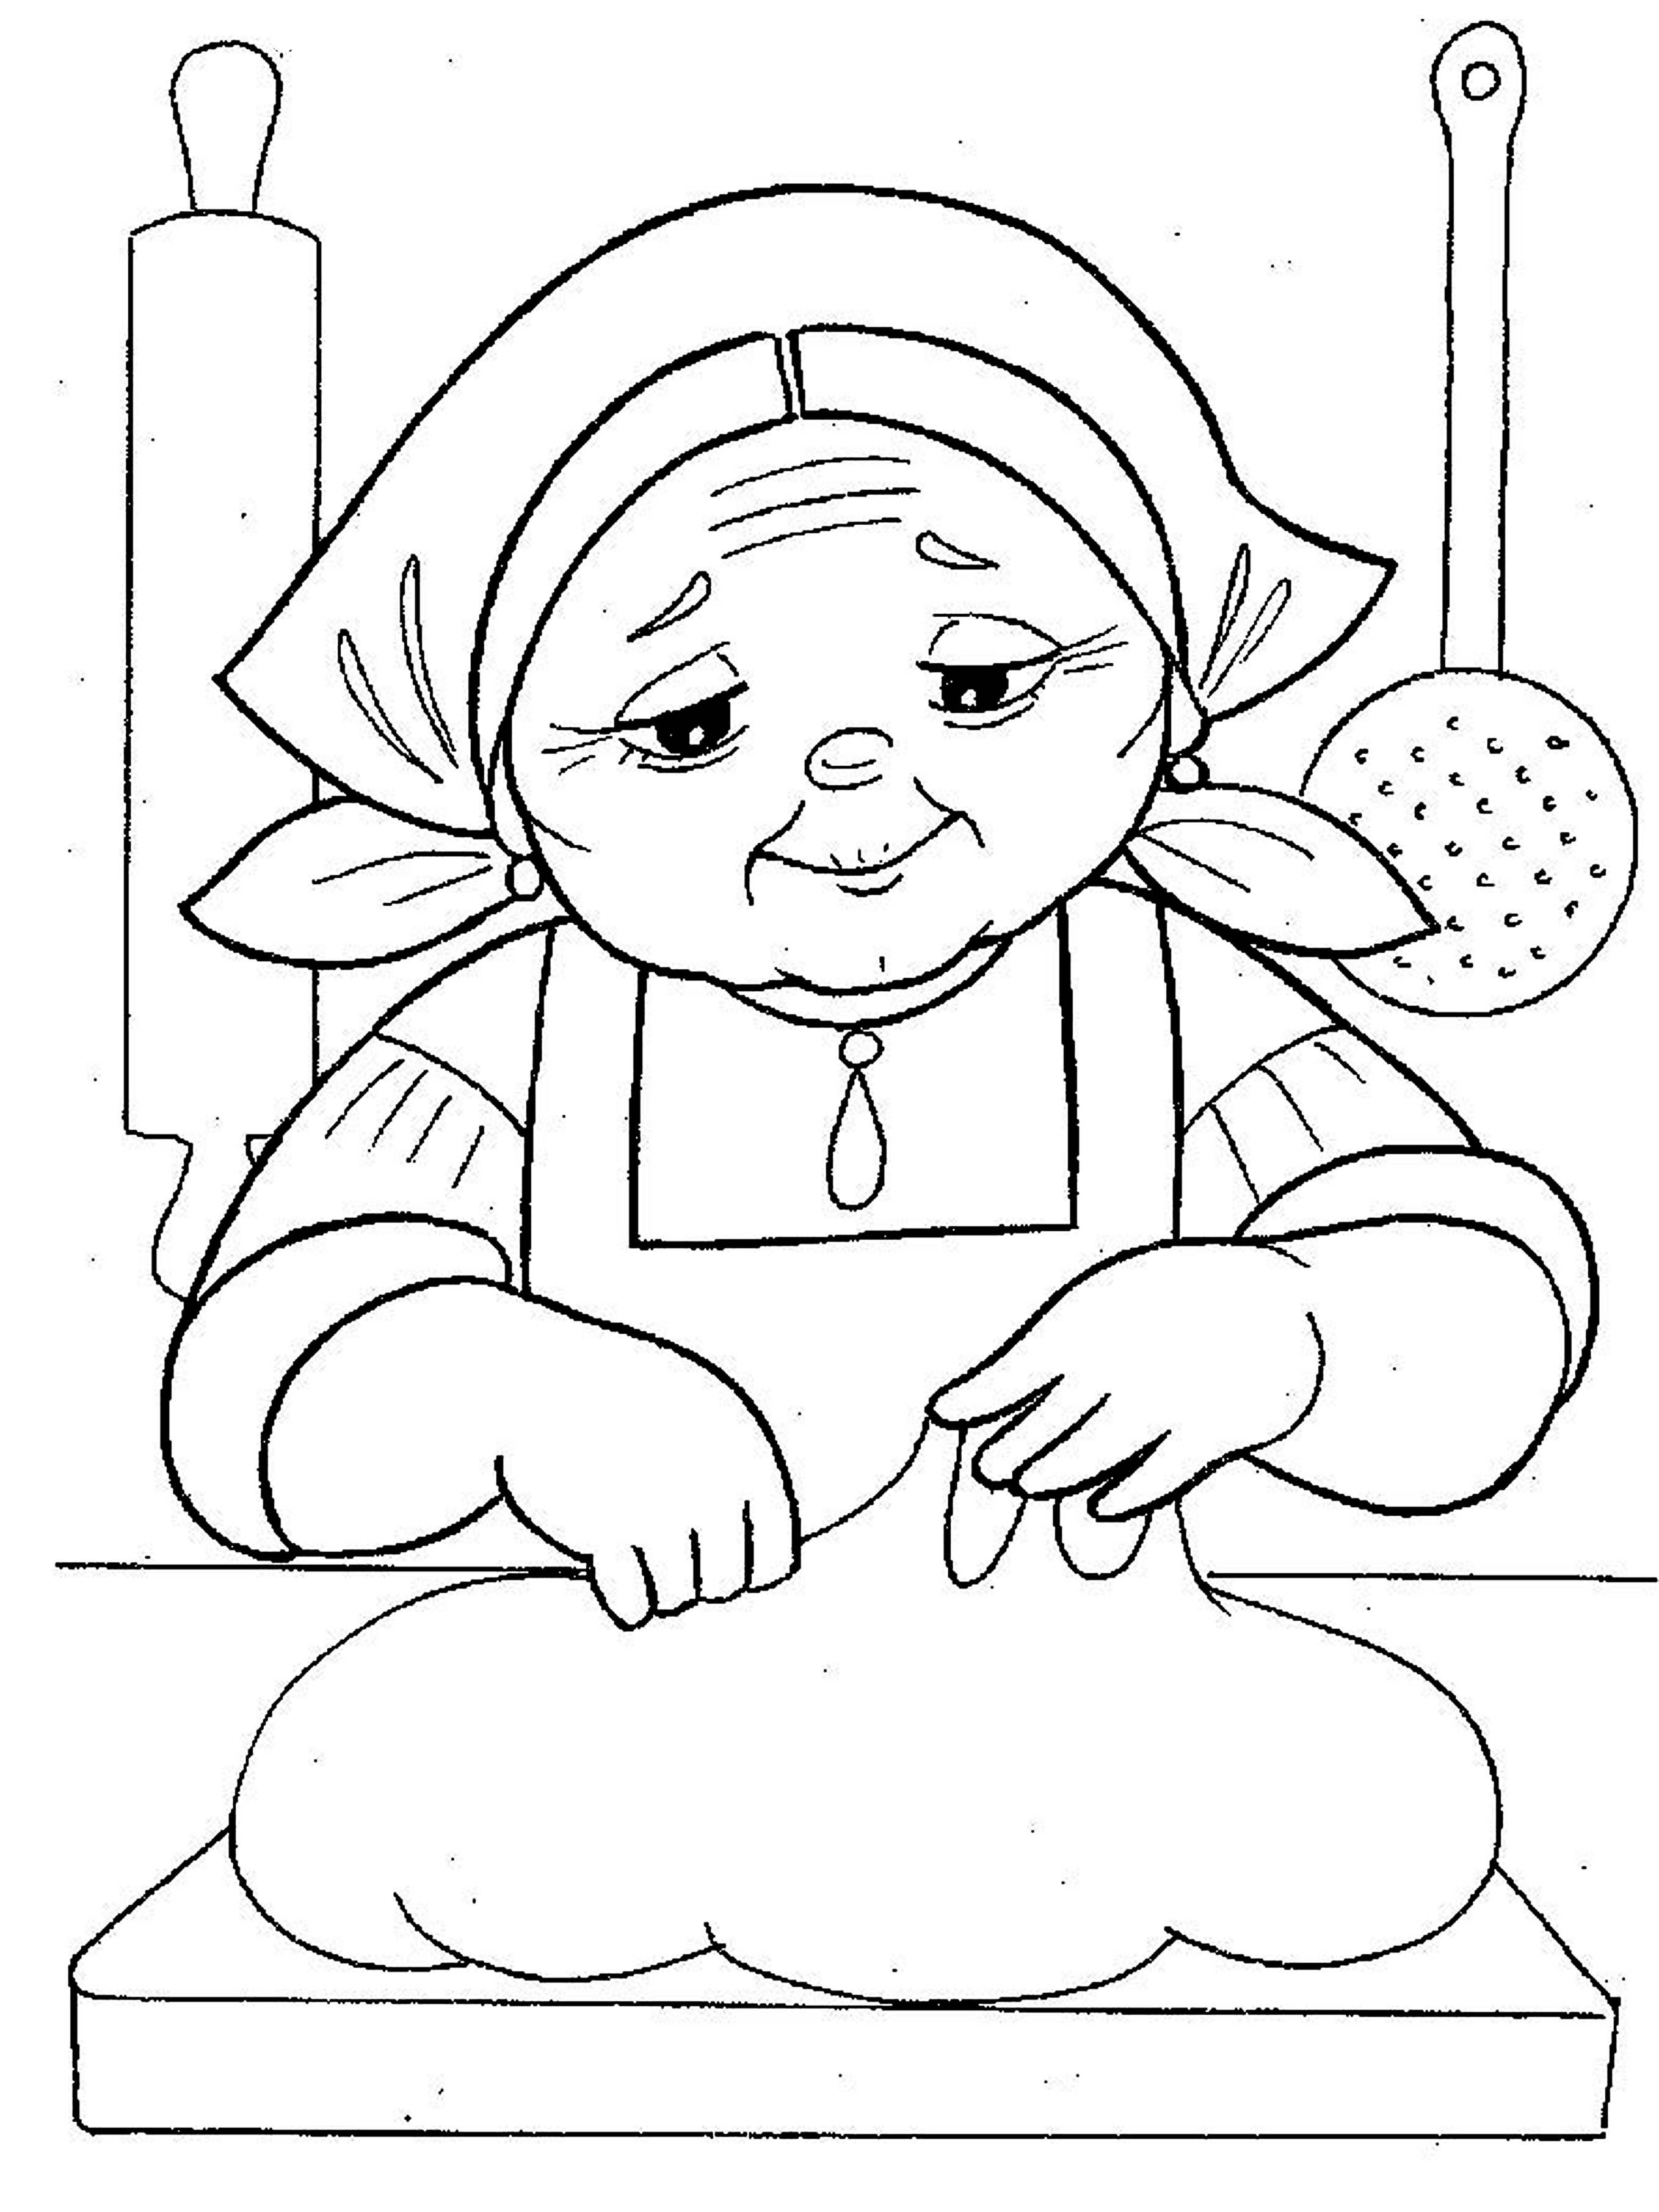 Coloring coloring pages to the tale bun Lead bun, bun, Bun grandmother